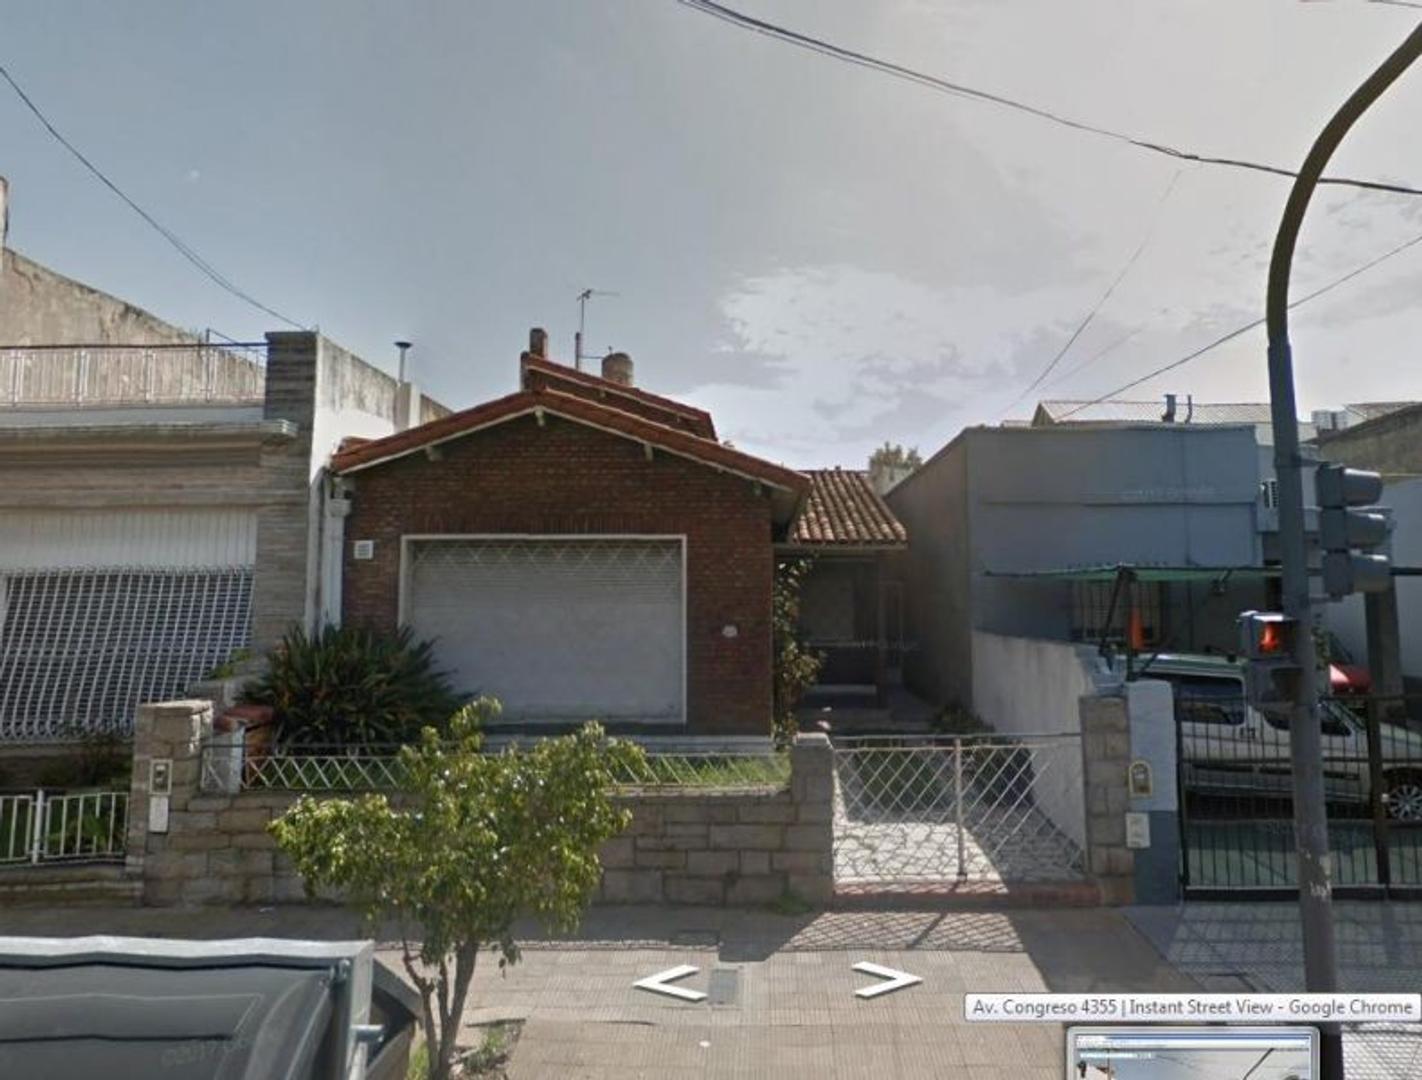 Lote - Venta - Argentina, Capital Federal - CONGRESO  AL 4300 - XINTEL(OPL-OPL-2842)